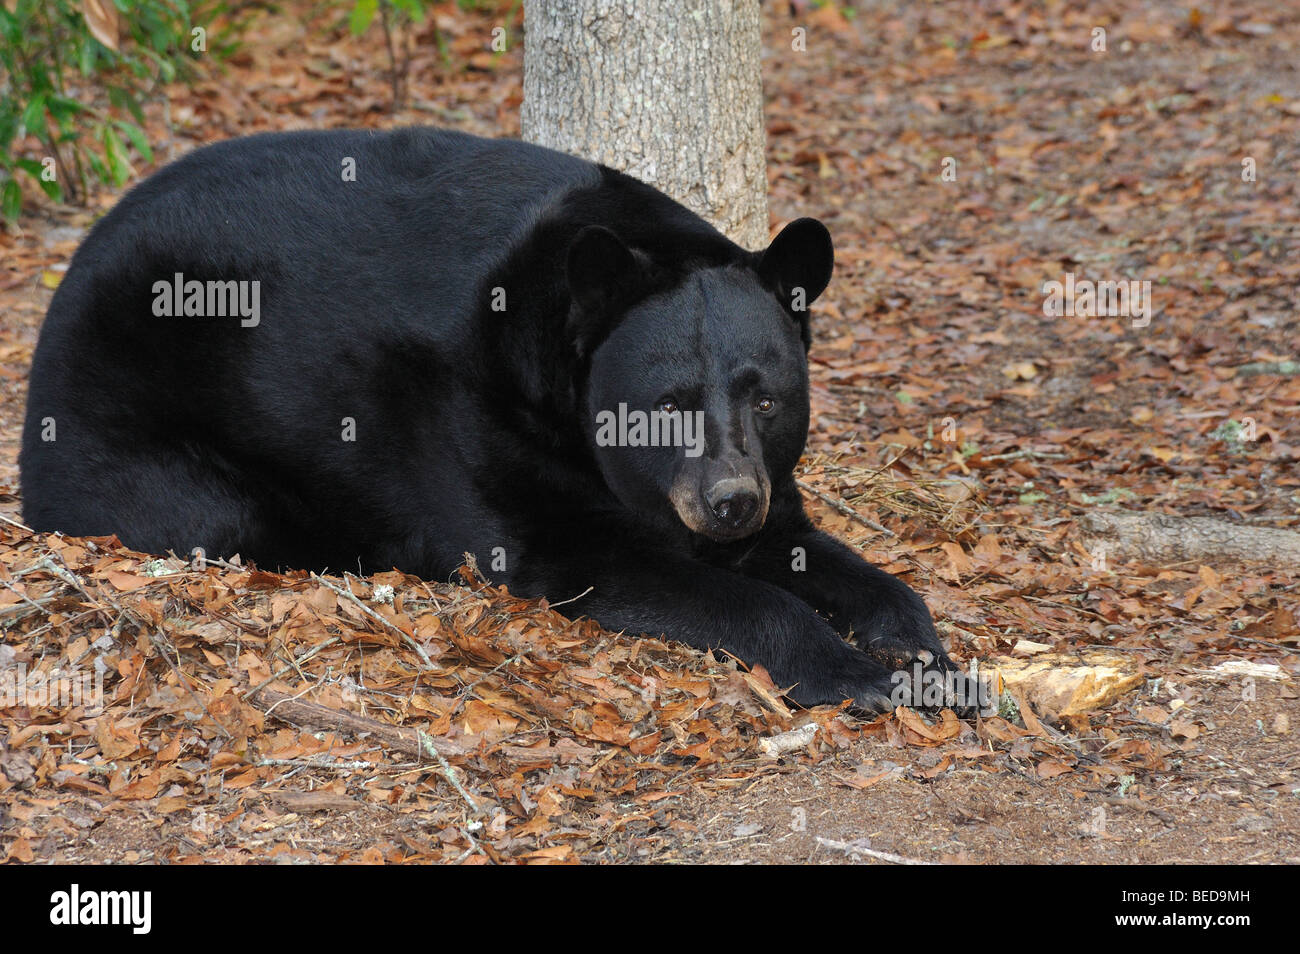 Black bear, Ursus americanus, Florida, captive - Stock Image